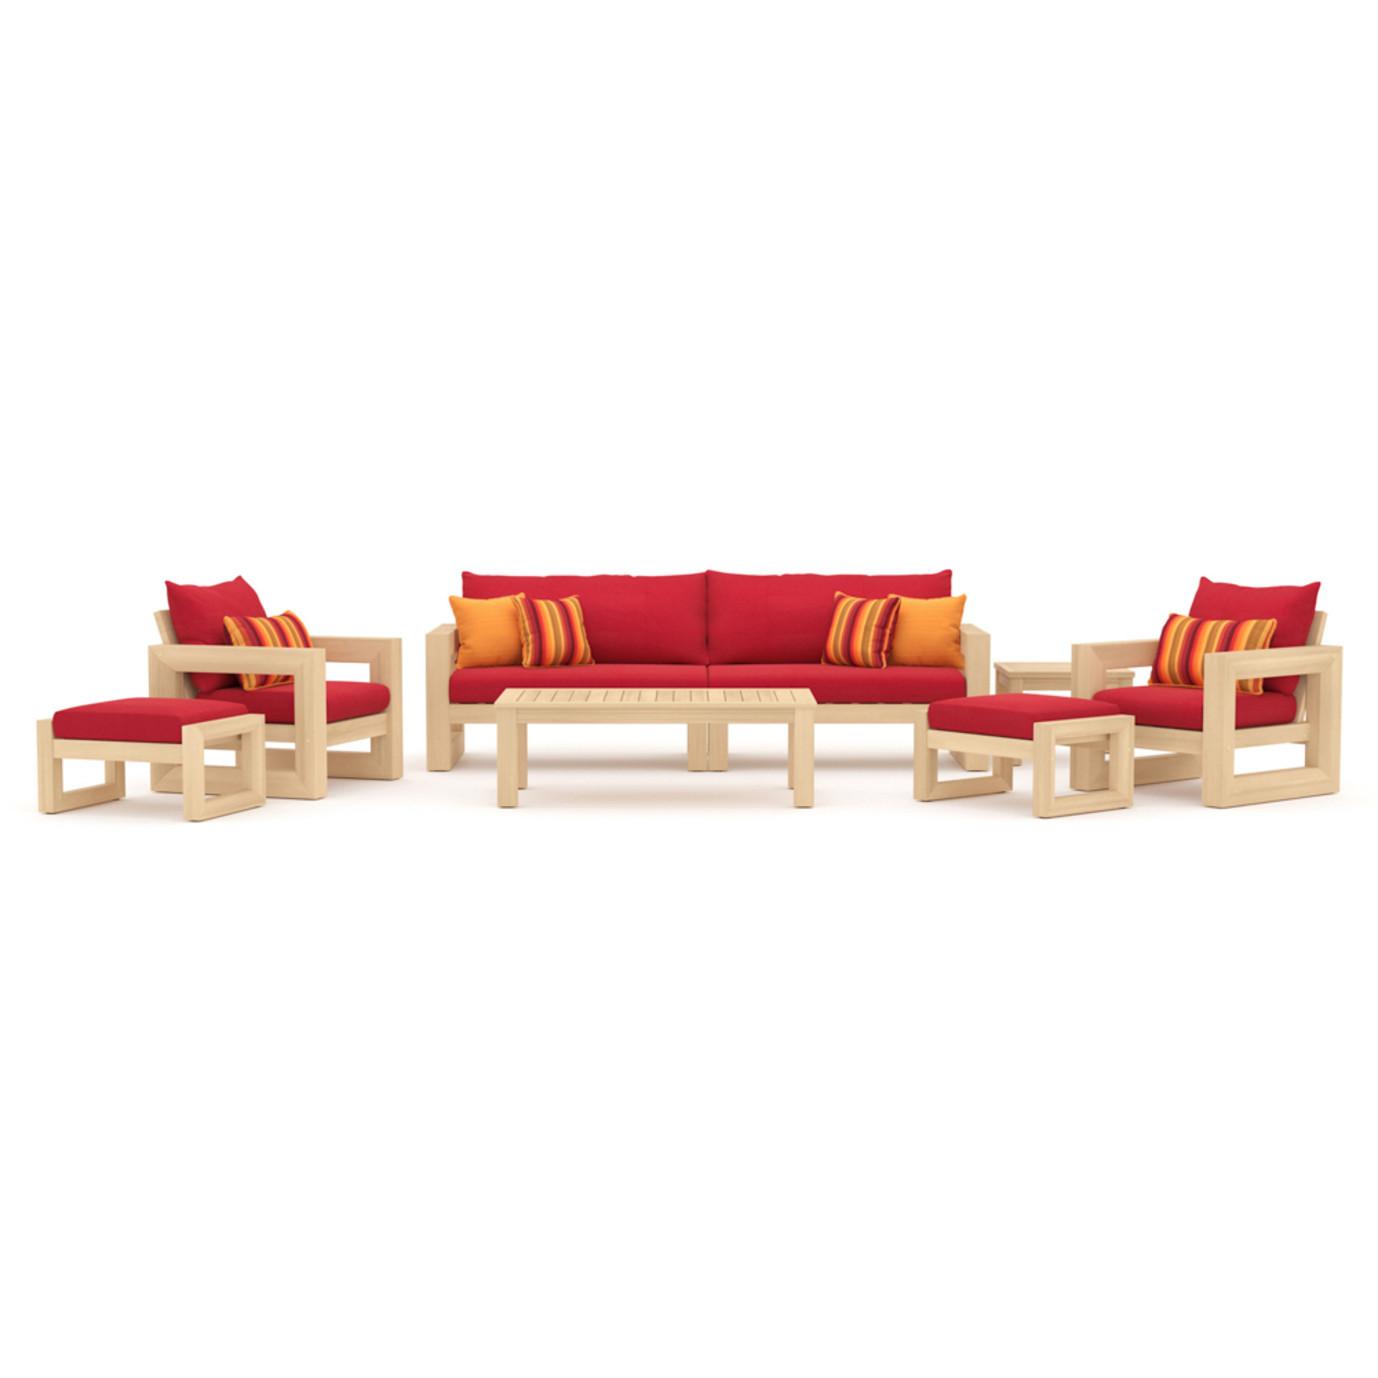 Benson 8pc Sofa & Club Chair Set - Sunset Red